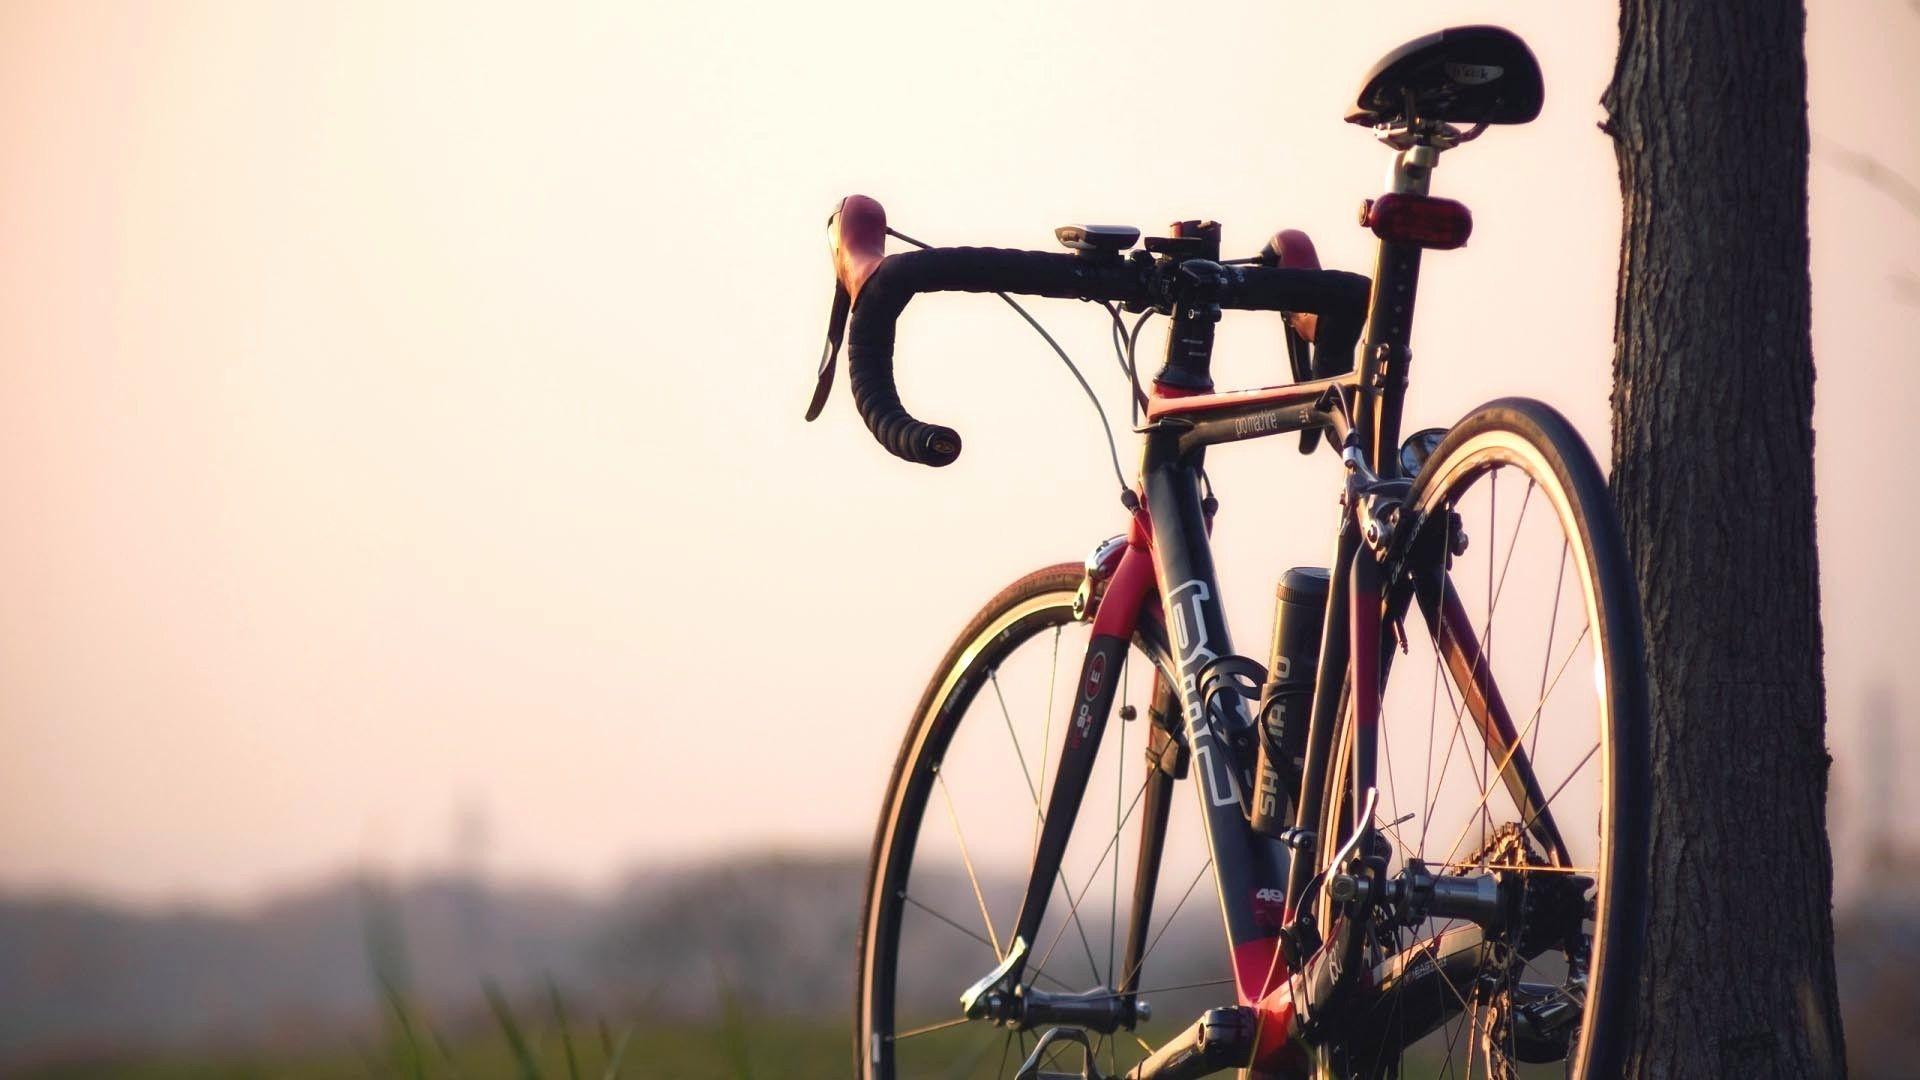 bicycle wallpaper hd 71433